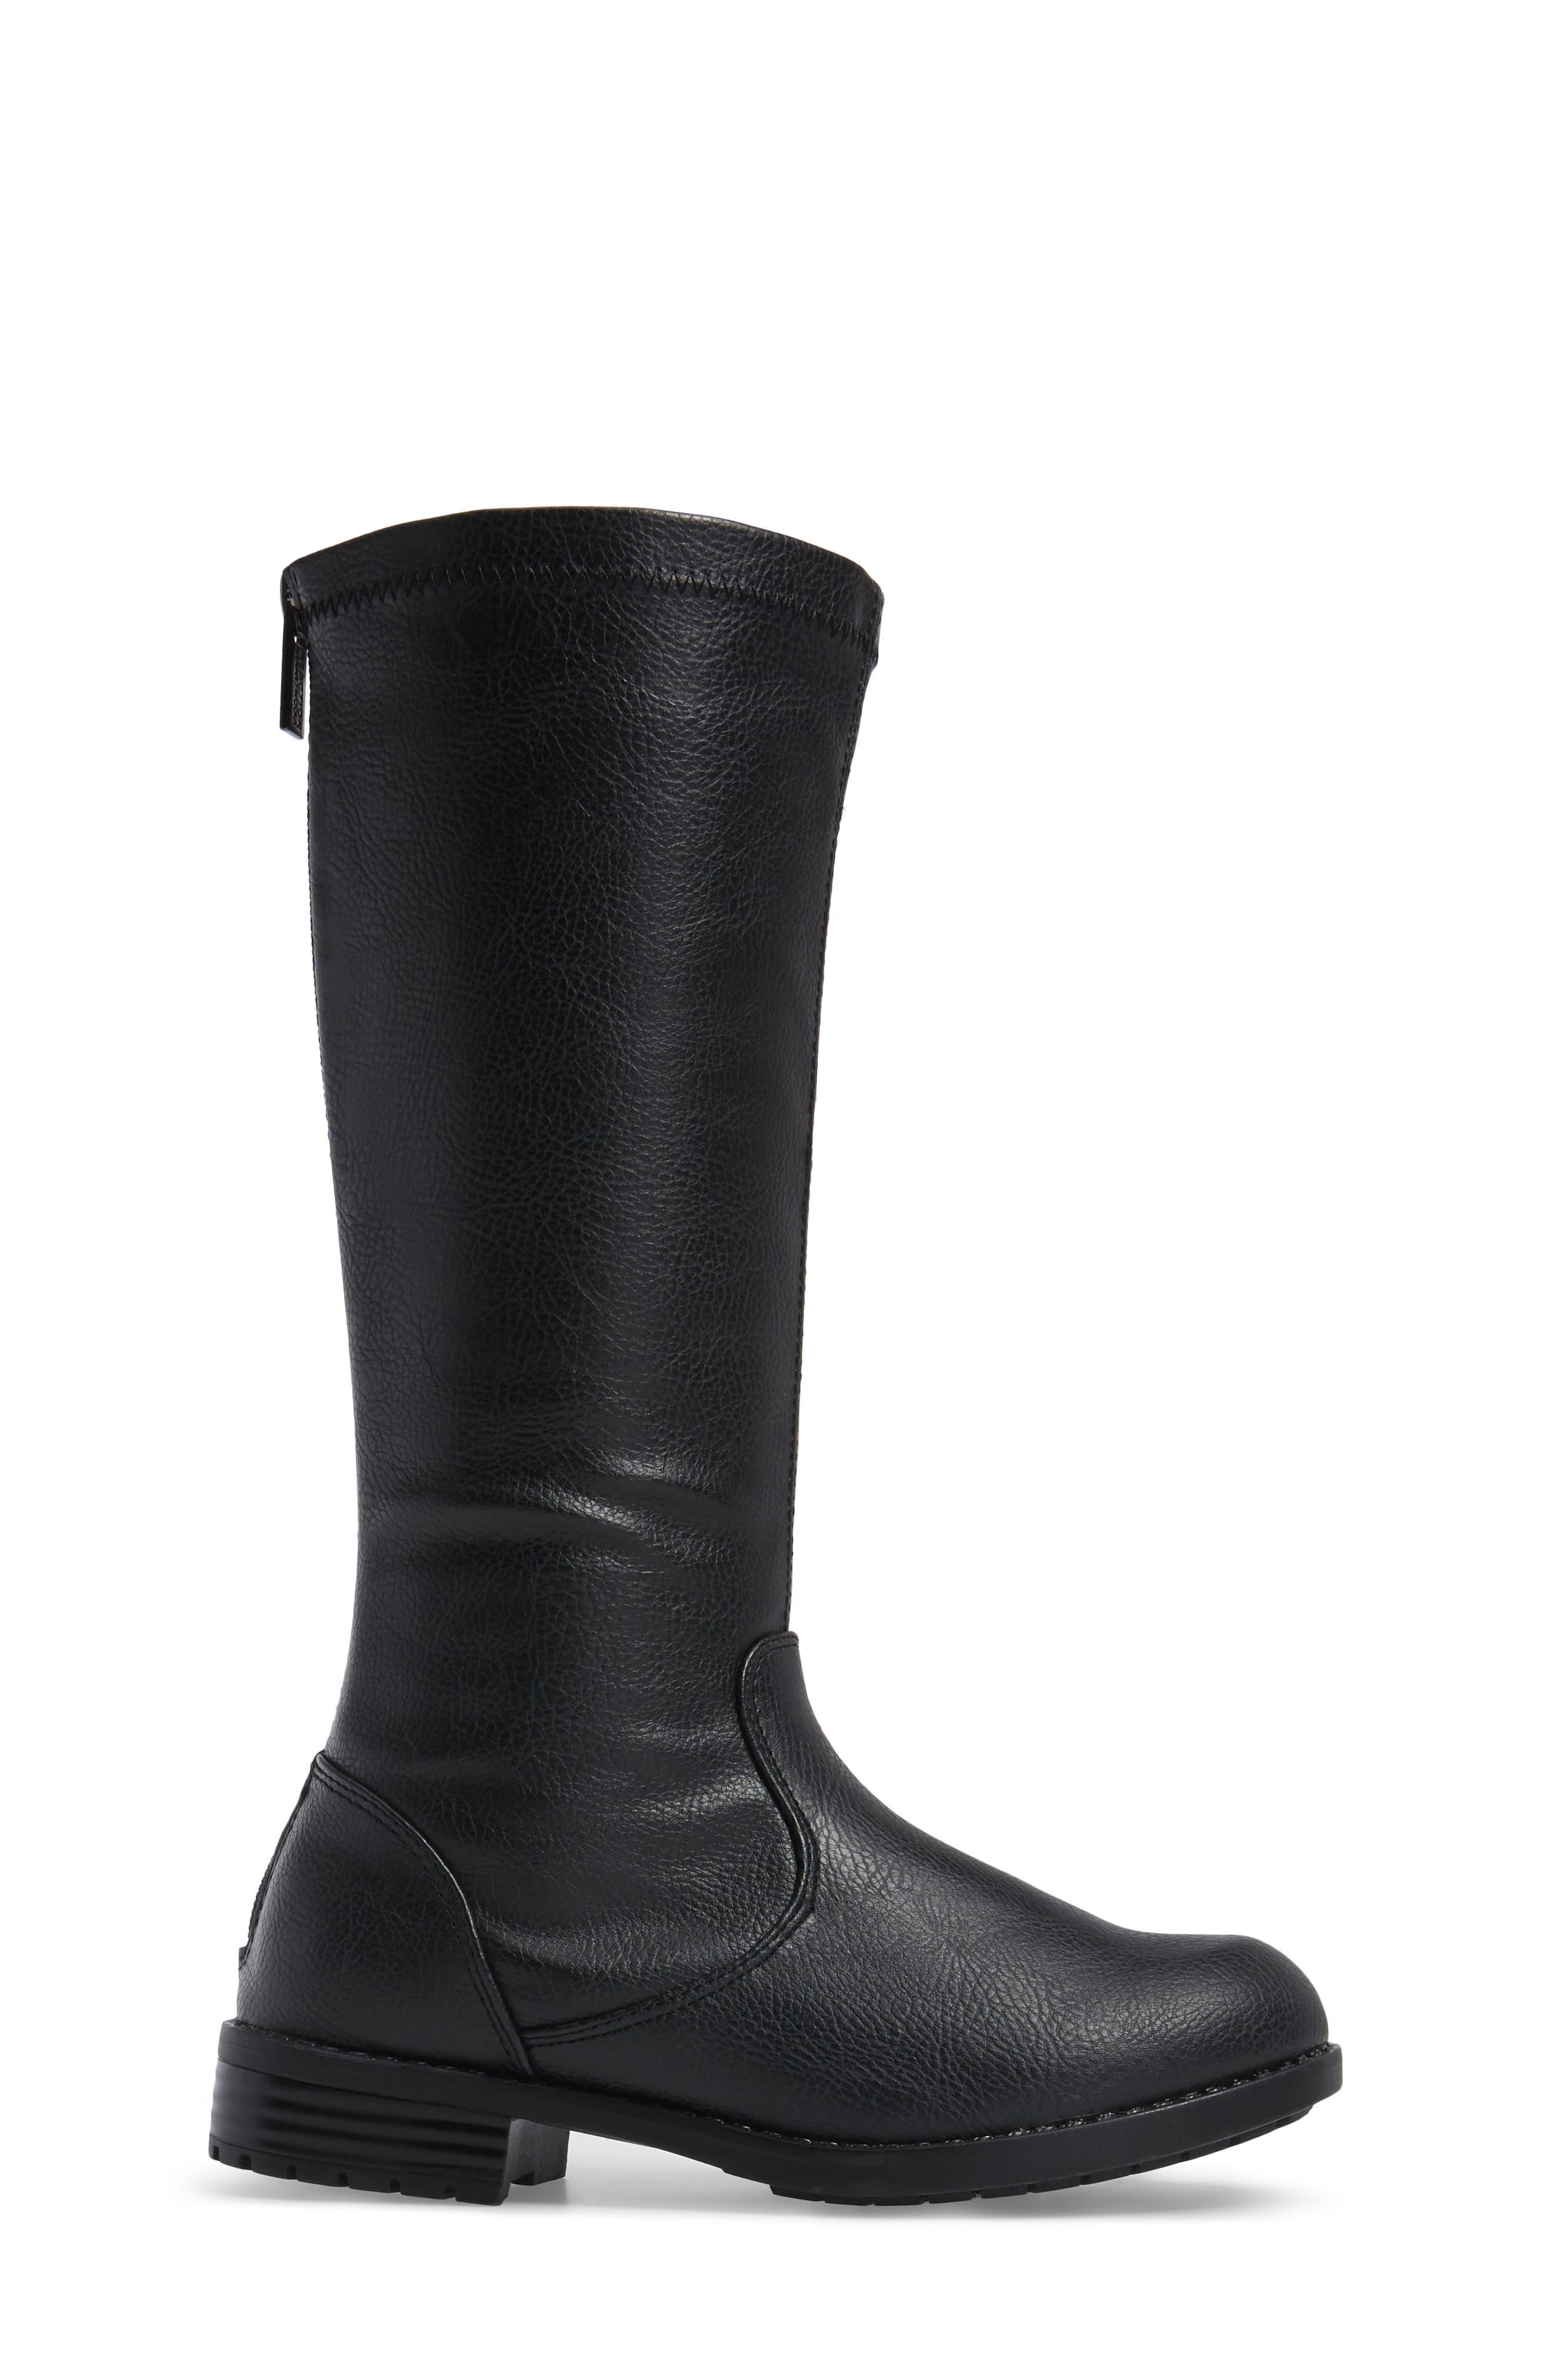 Autumn Stretch Boot,                             Alternate thumbnail 3, color,                             Black Faux Leather